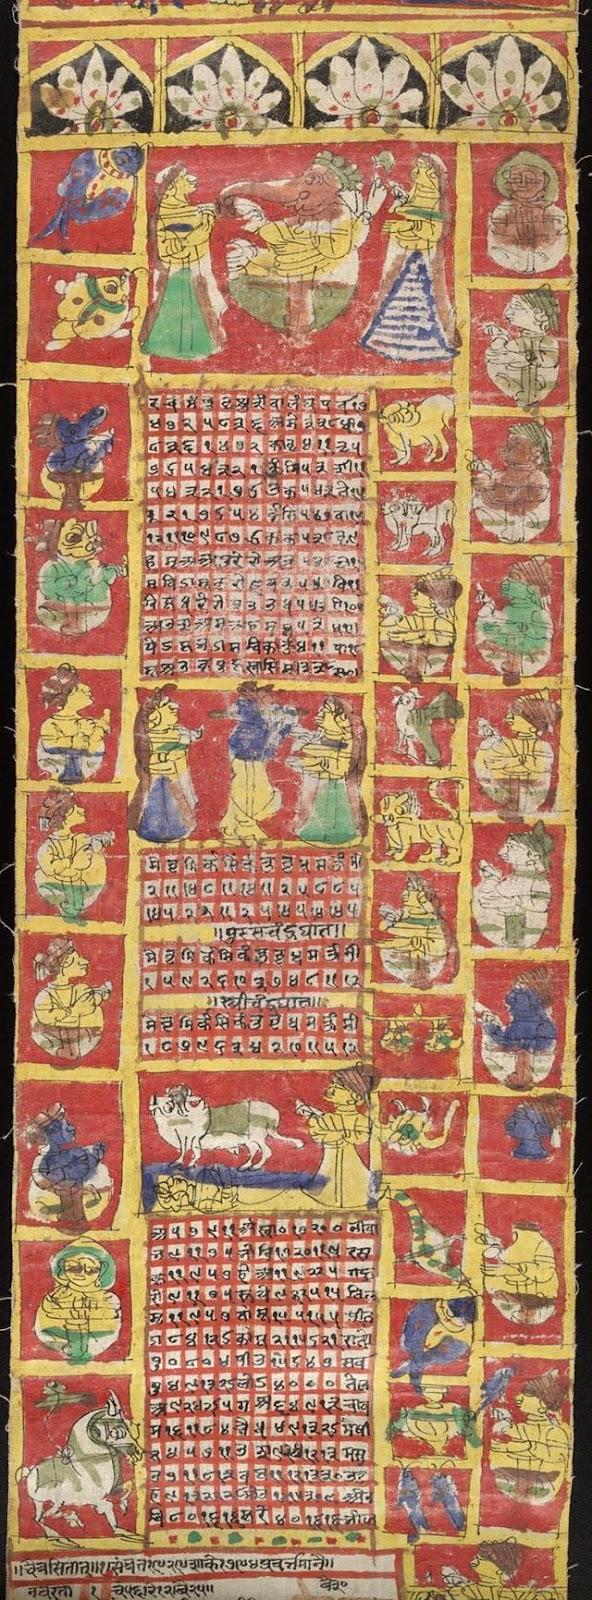 https://upload.wikimedia.org/wikipedia/commons/0/04/Hindu_calendar_1871-72.jpg